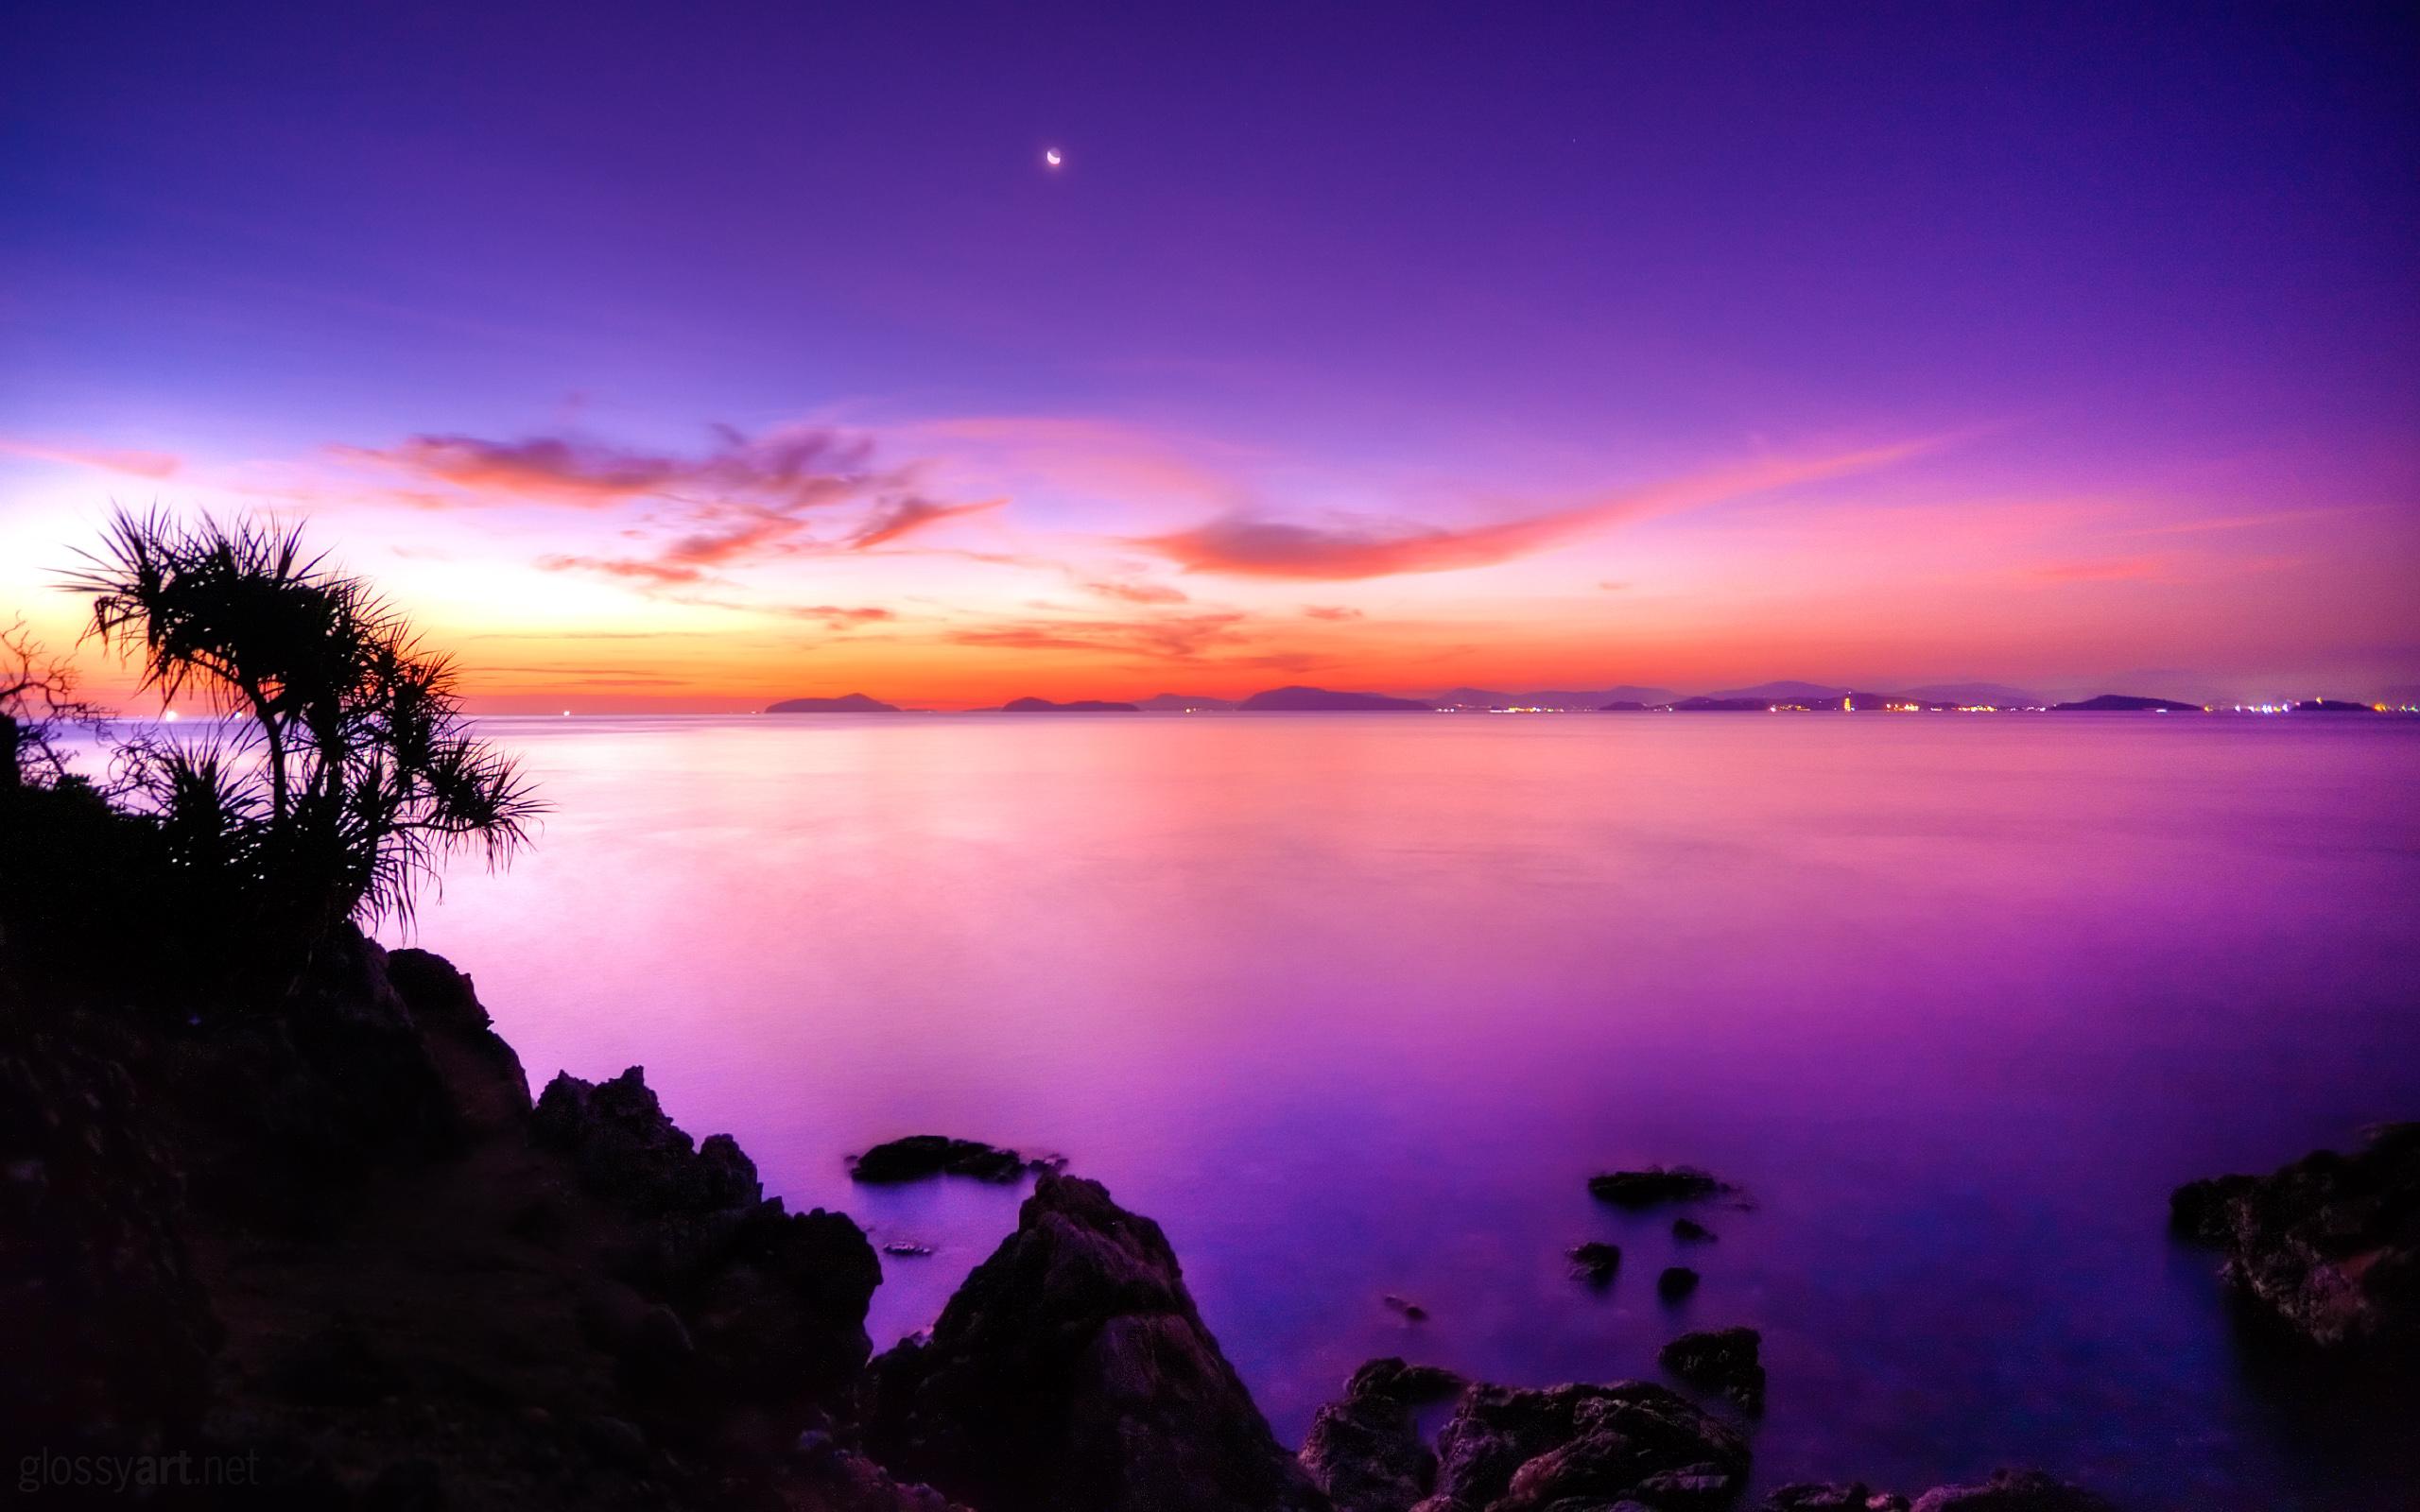 HD Wallpapers Sunset Moonrise